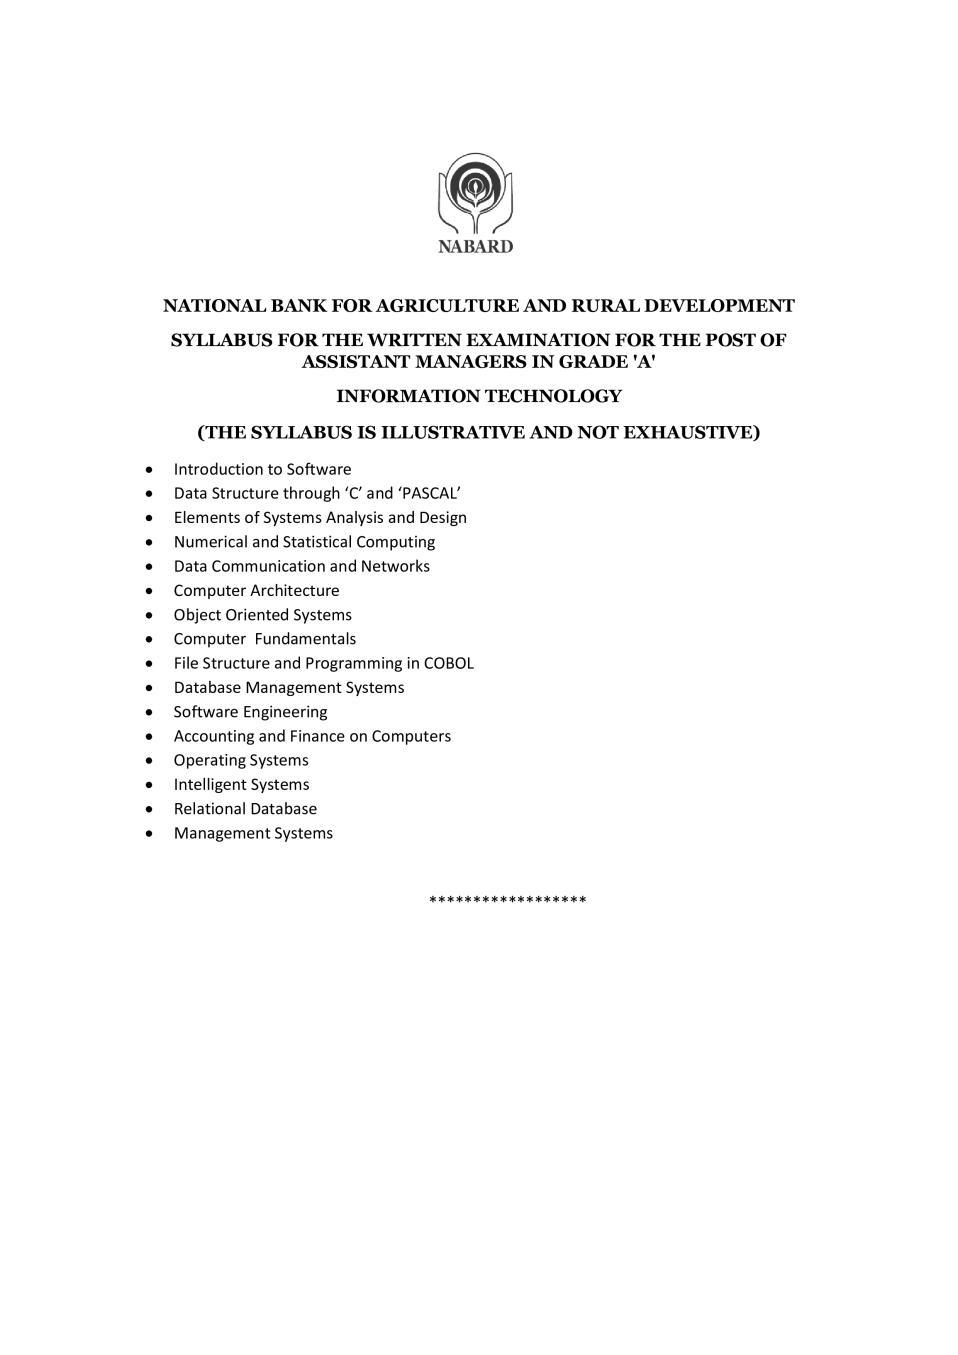 NABARD Grade A Syllabus 2020 Information Technology - Page 1